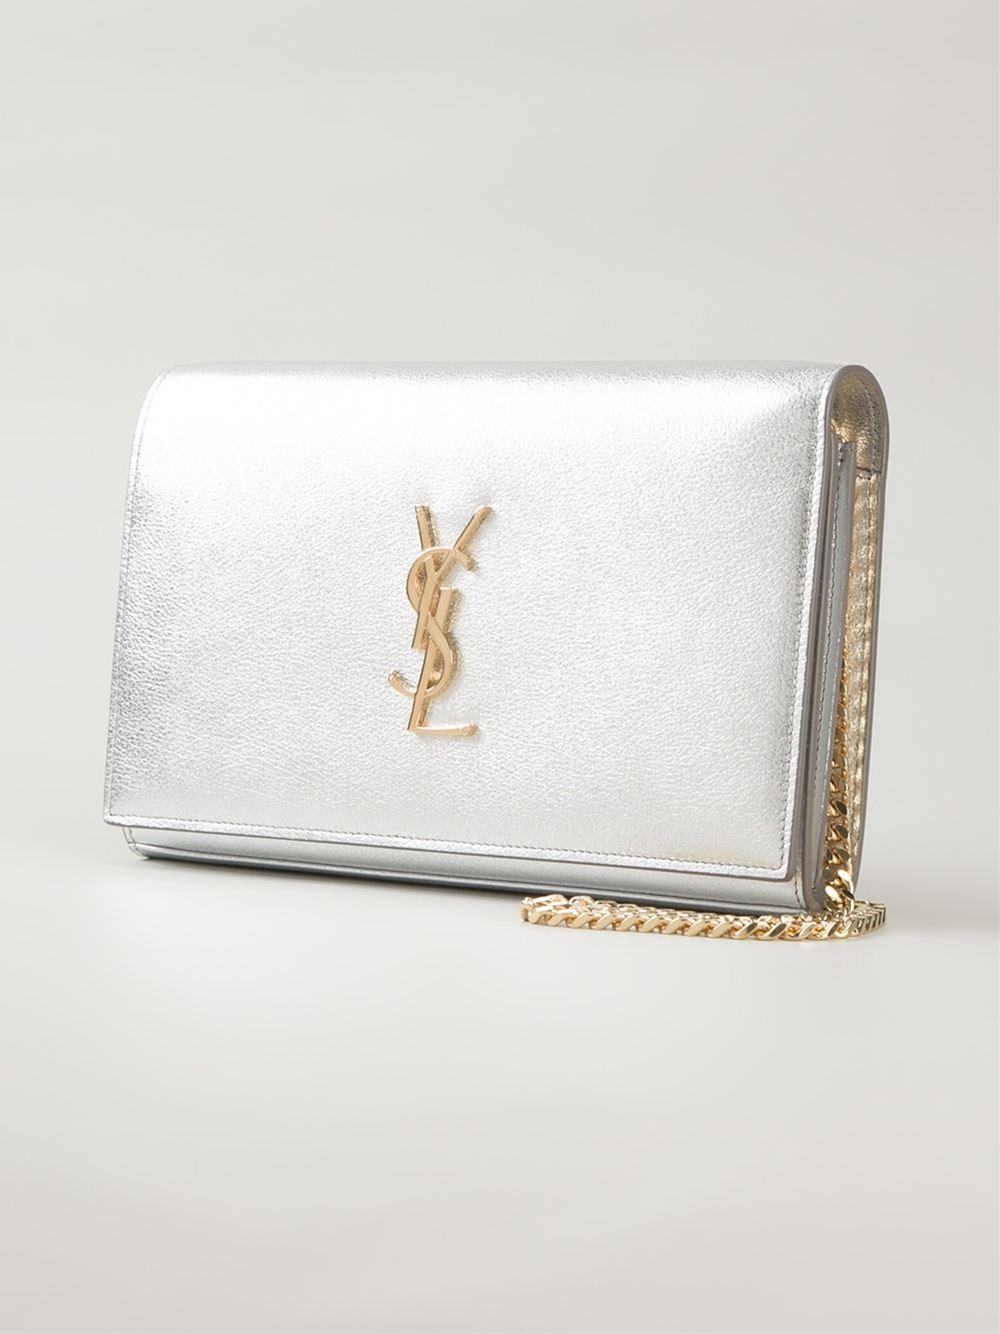 ysl bags replica - classic small kate monogram saint laurent tassel satchel in silver ...